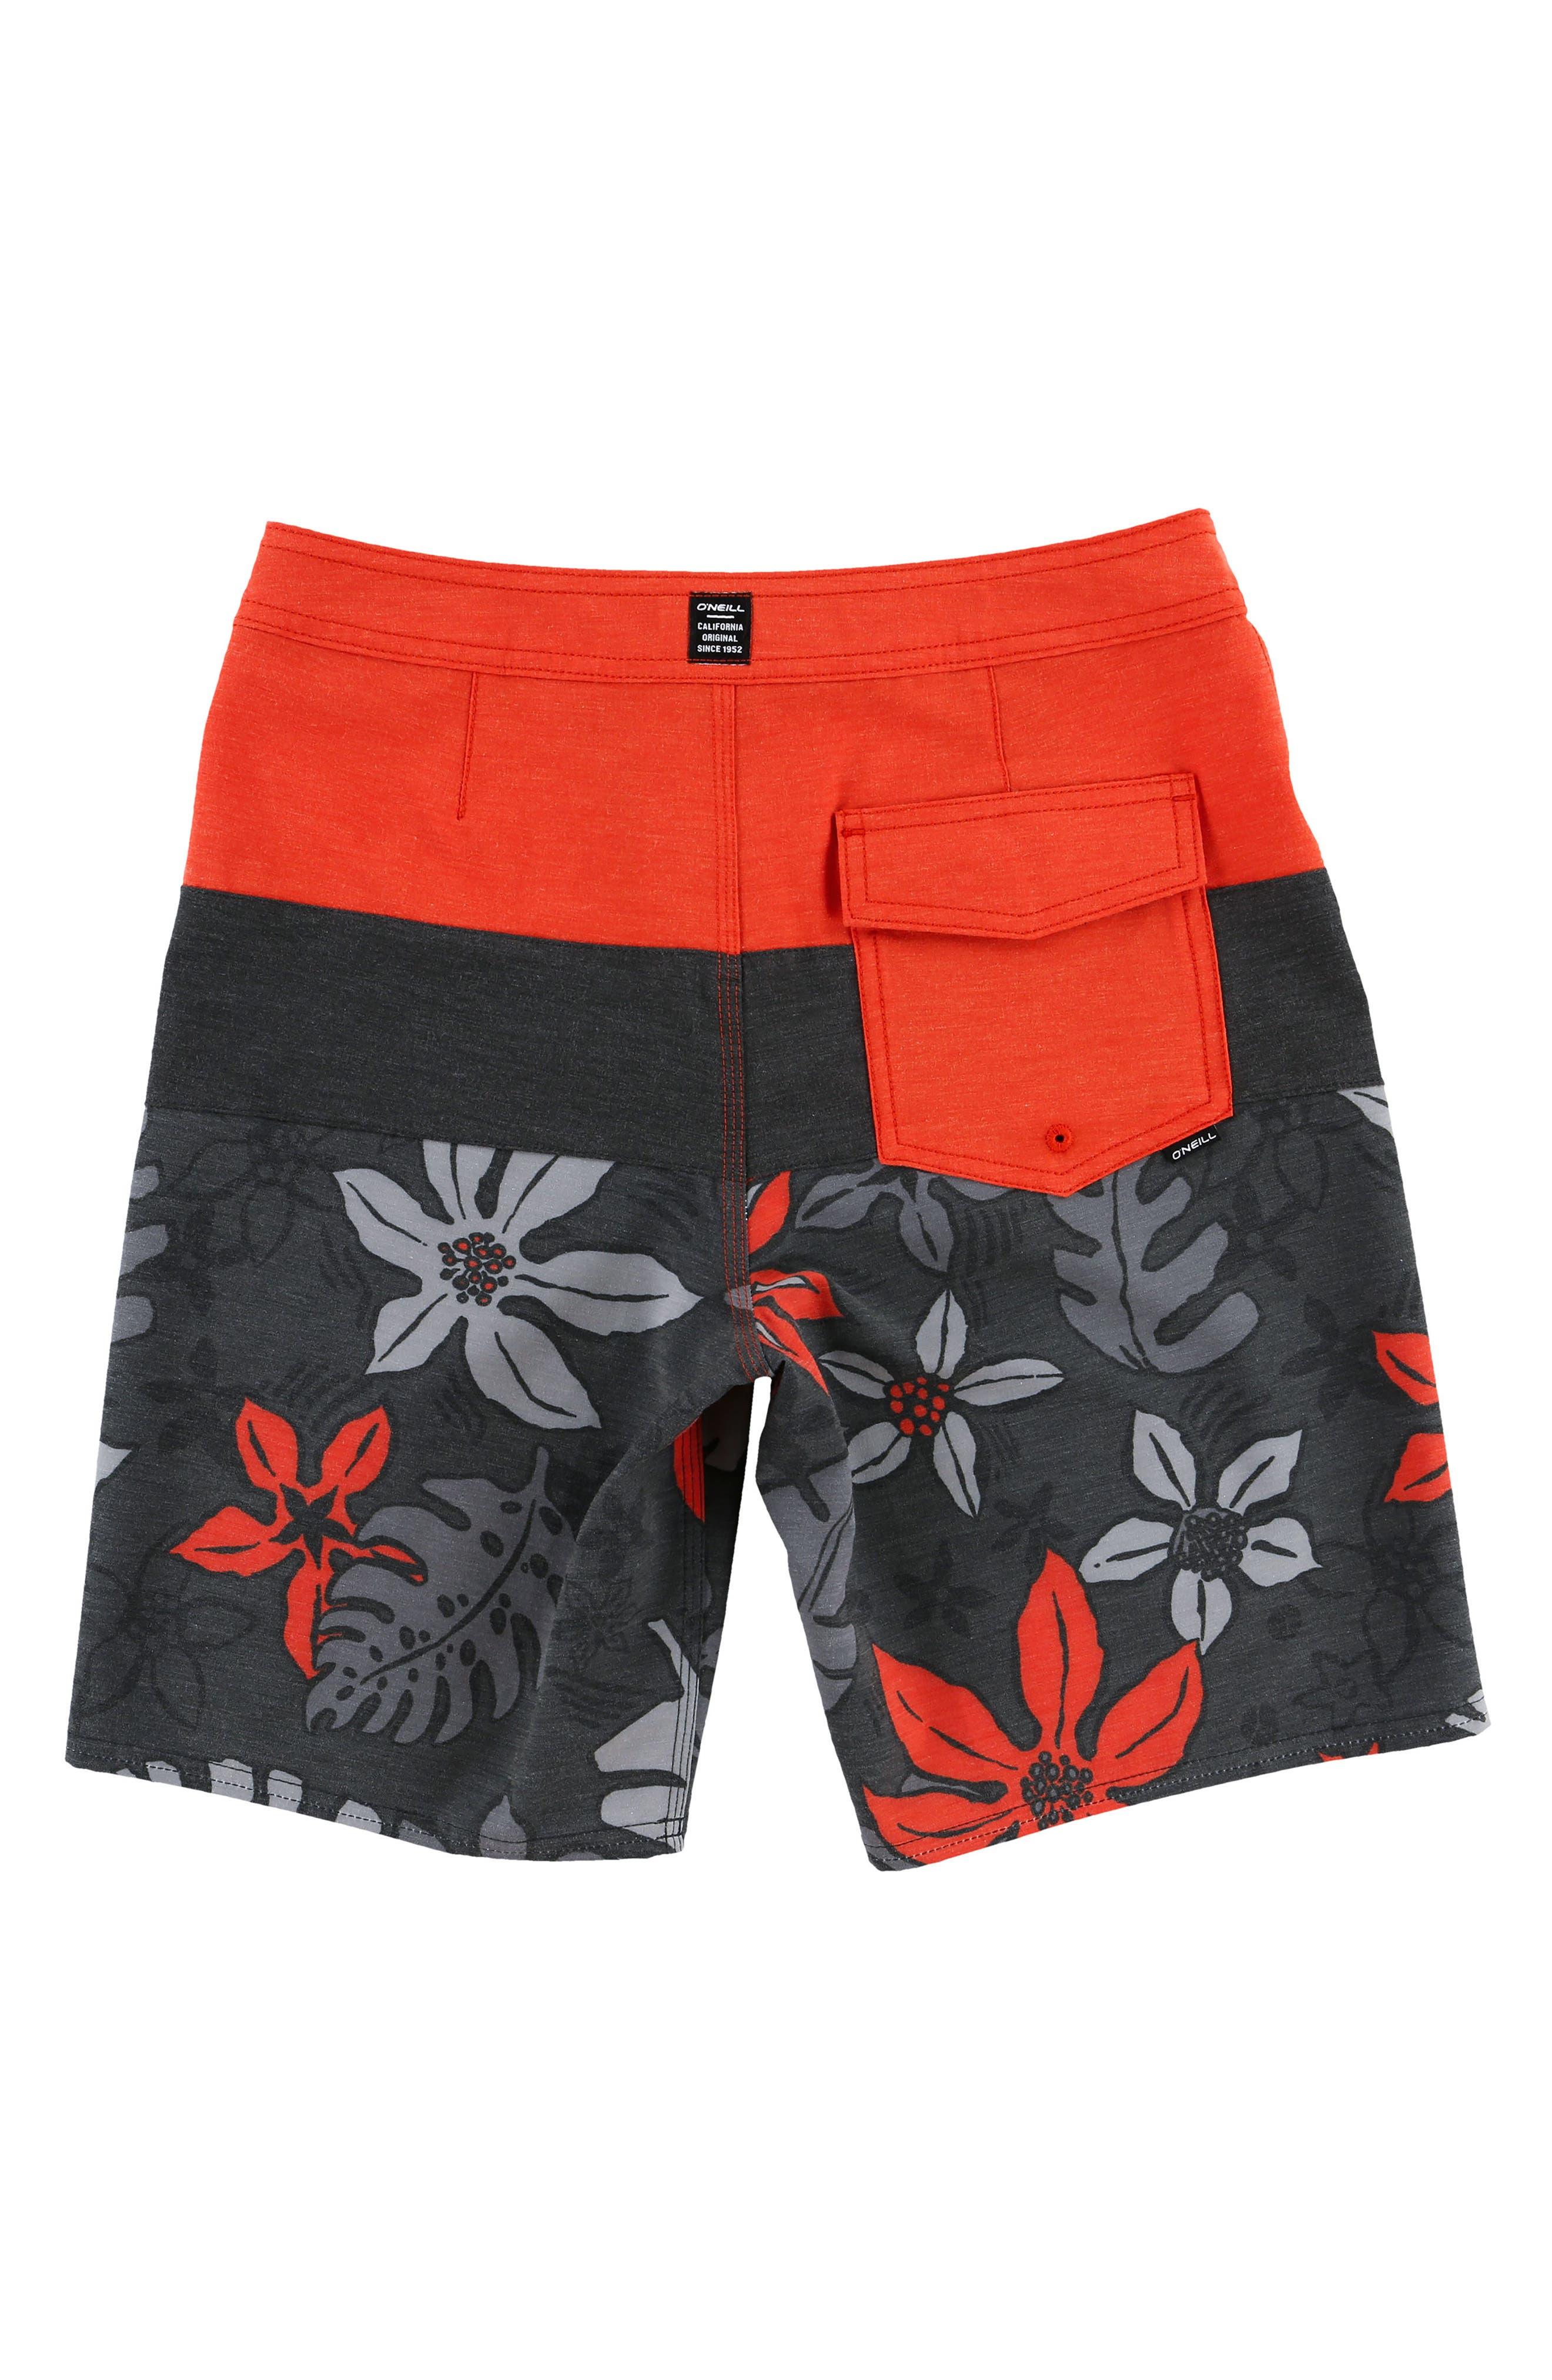 Hyperfreak Lahaina Board Shorts,                             Alternate thumbnail 2, color,                             Neon Red